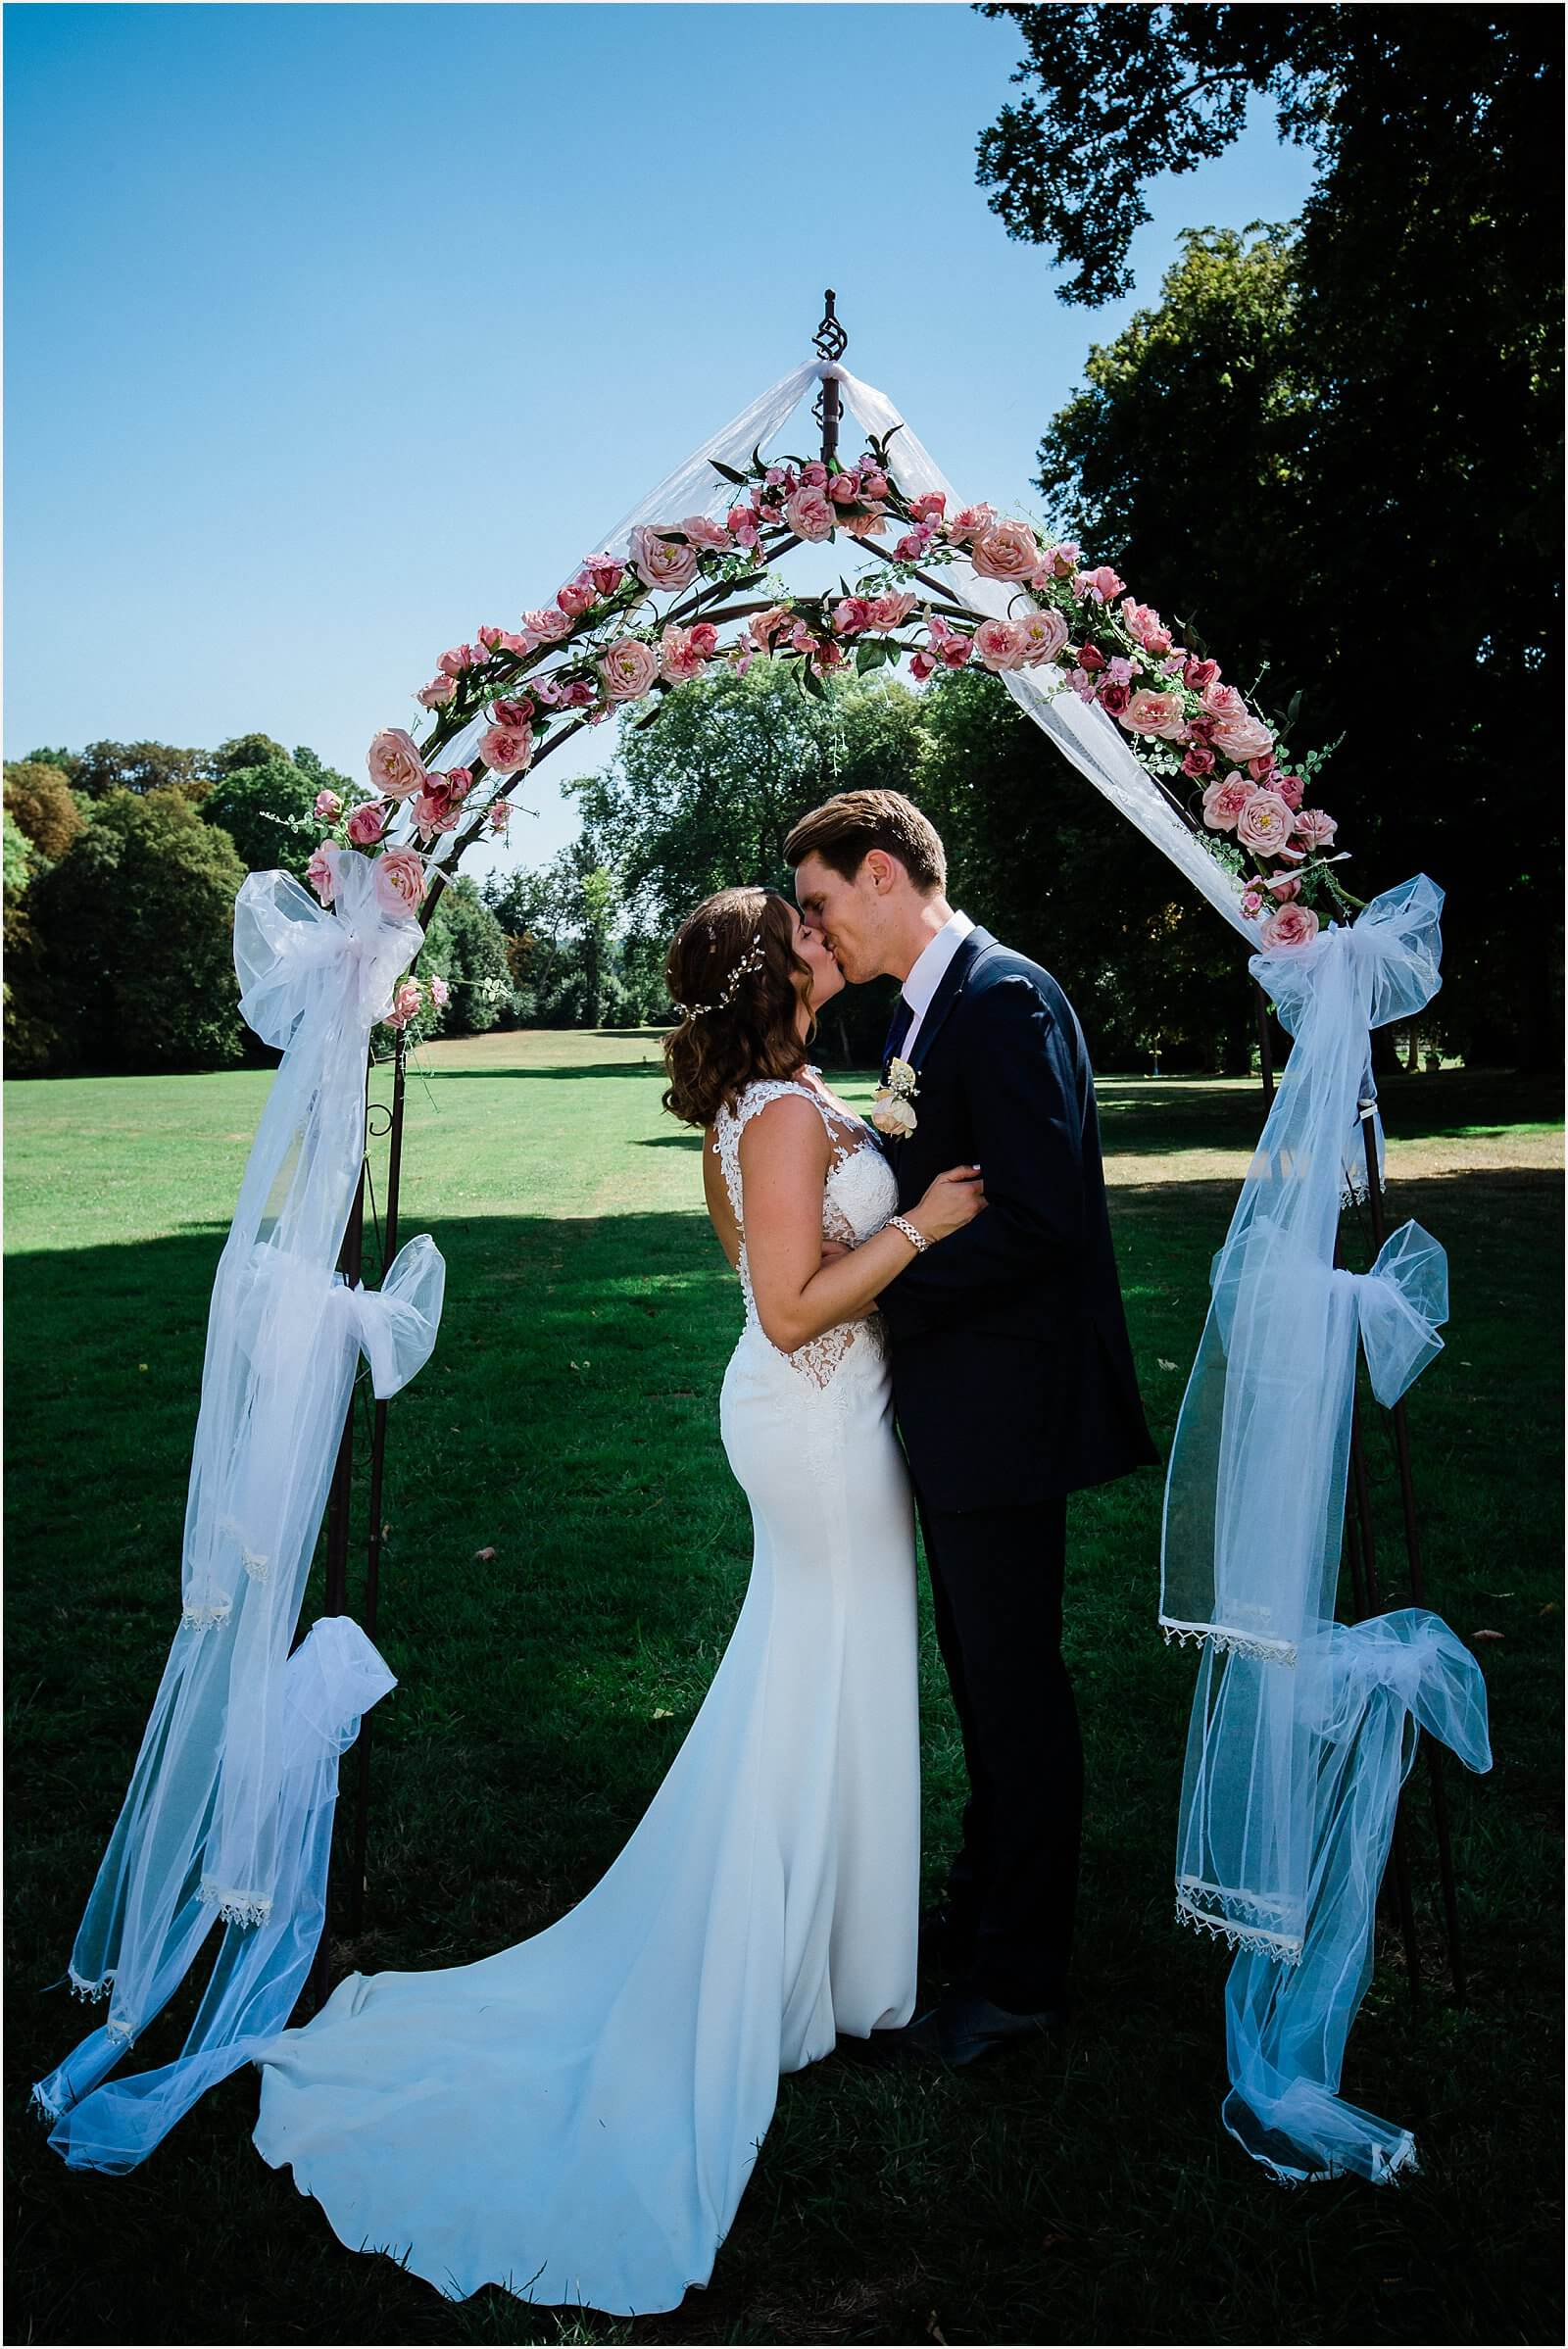 Chateau de Courtomer Wedding | Chantel & Evan 36